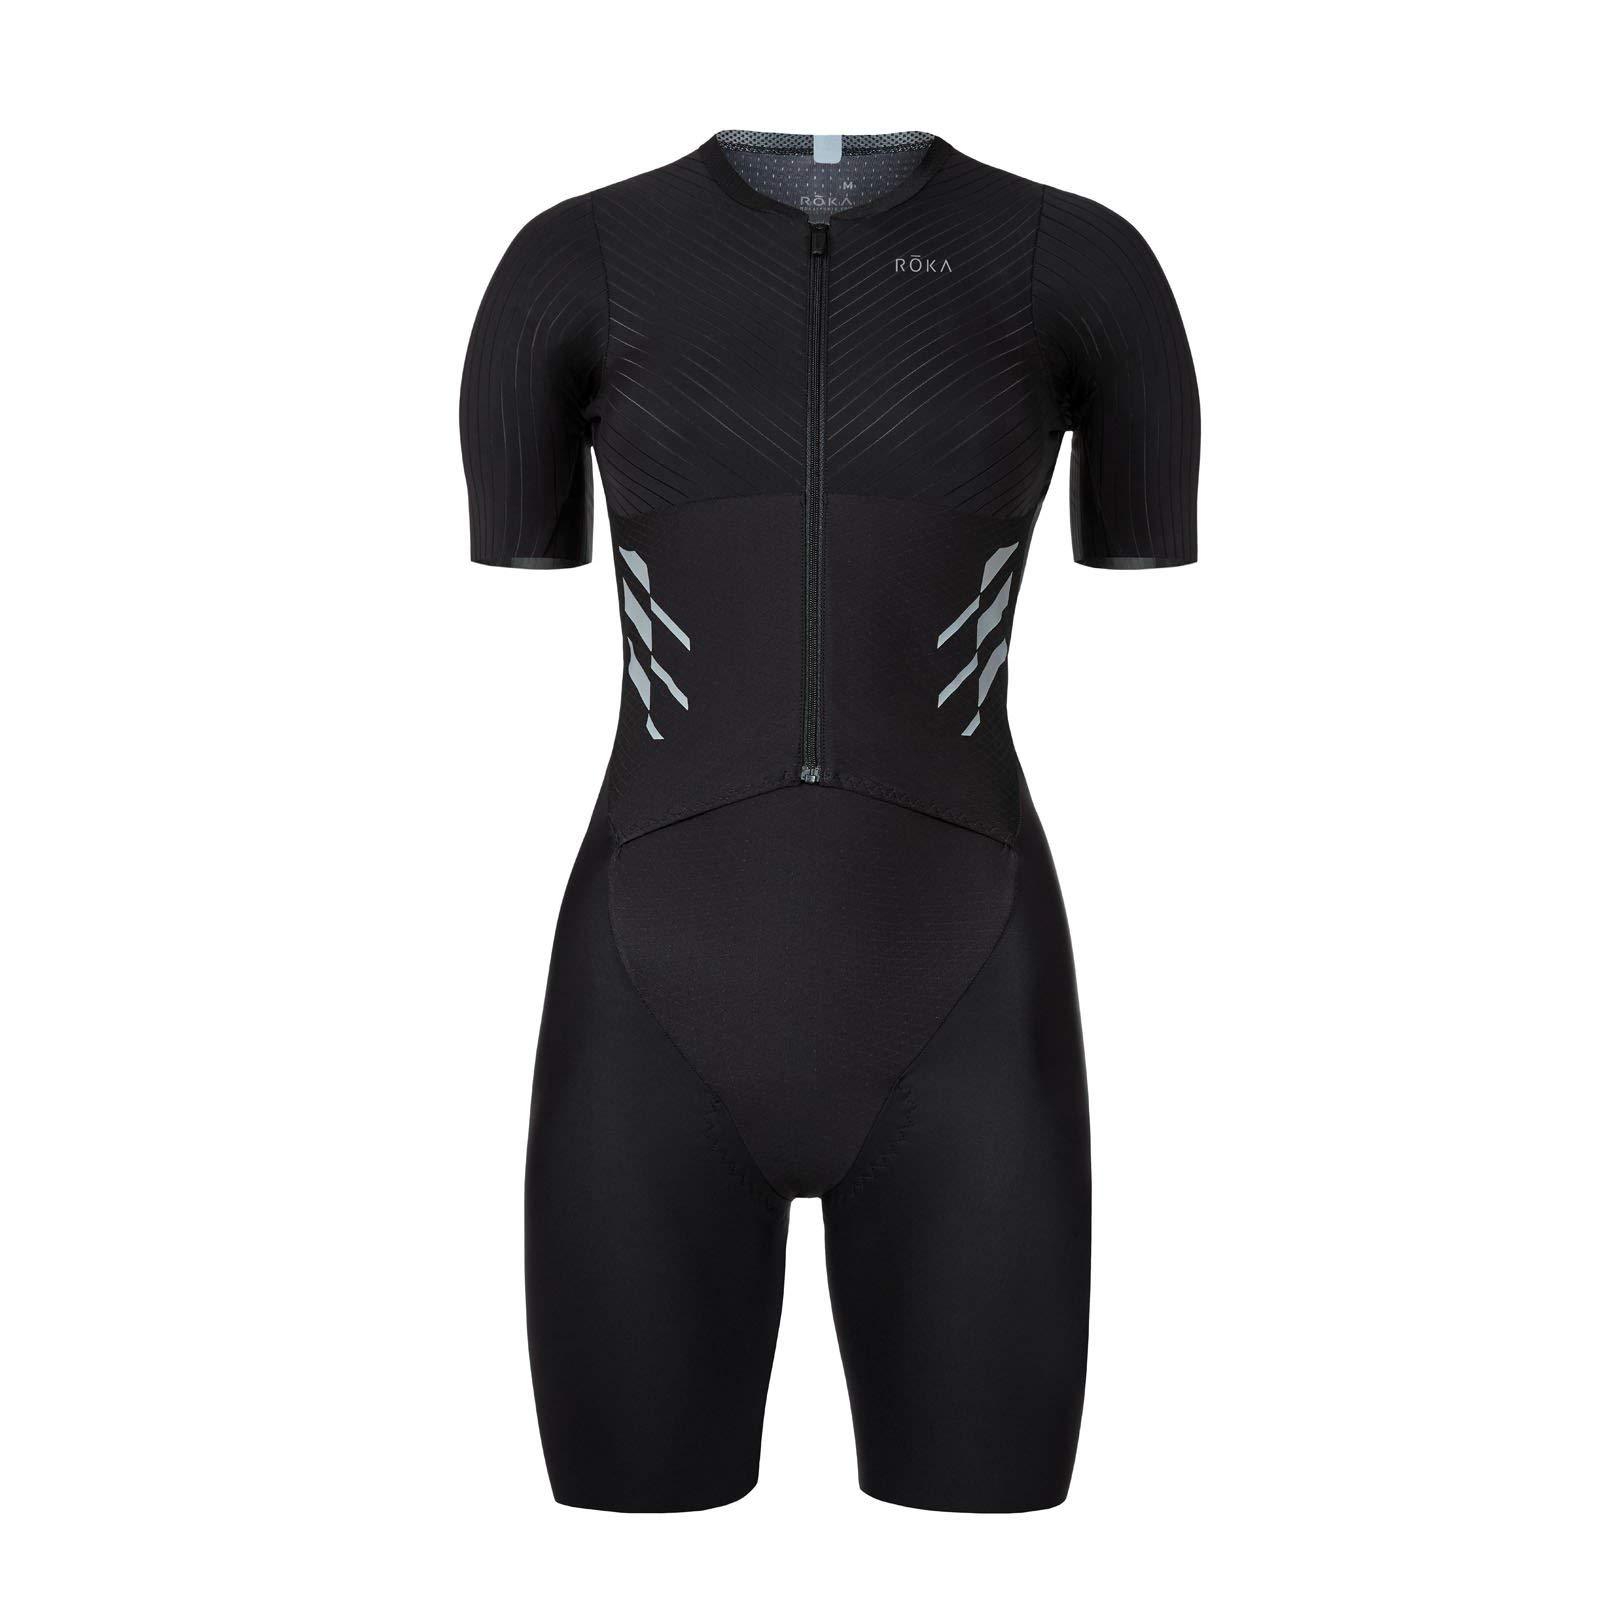 ROKA Women's Gen II Elite Aero Short Sleeve Triathlon Sport Suit - Black - X-Small